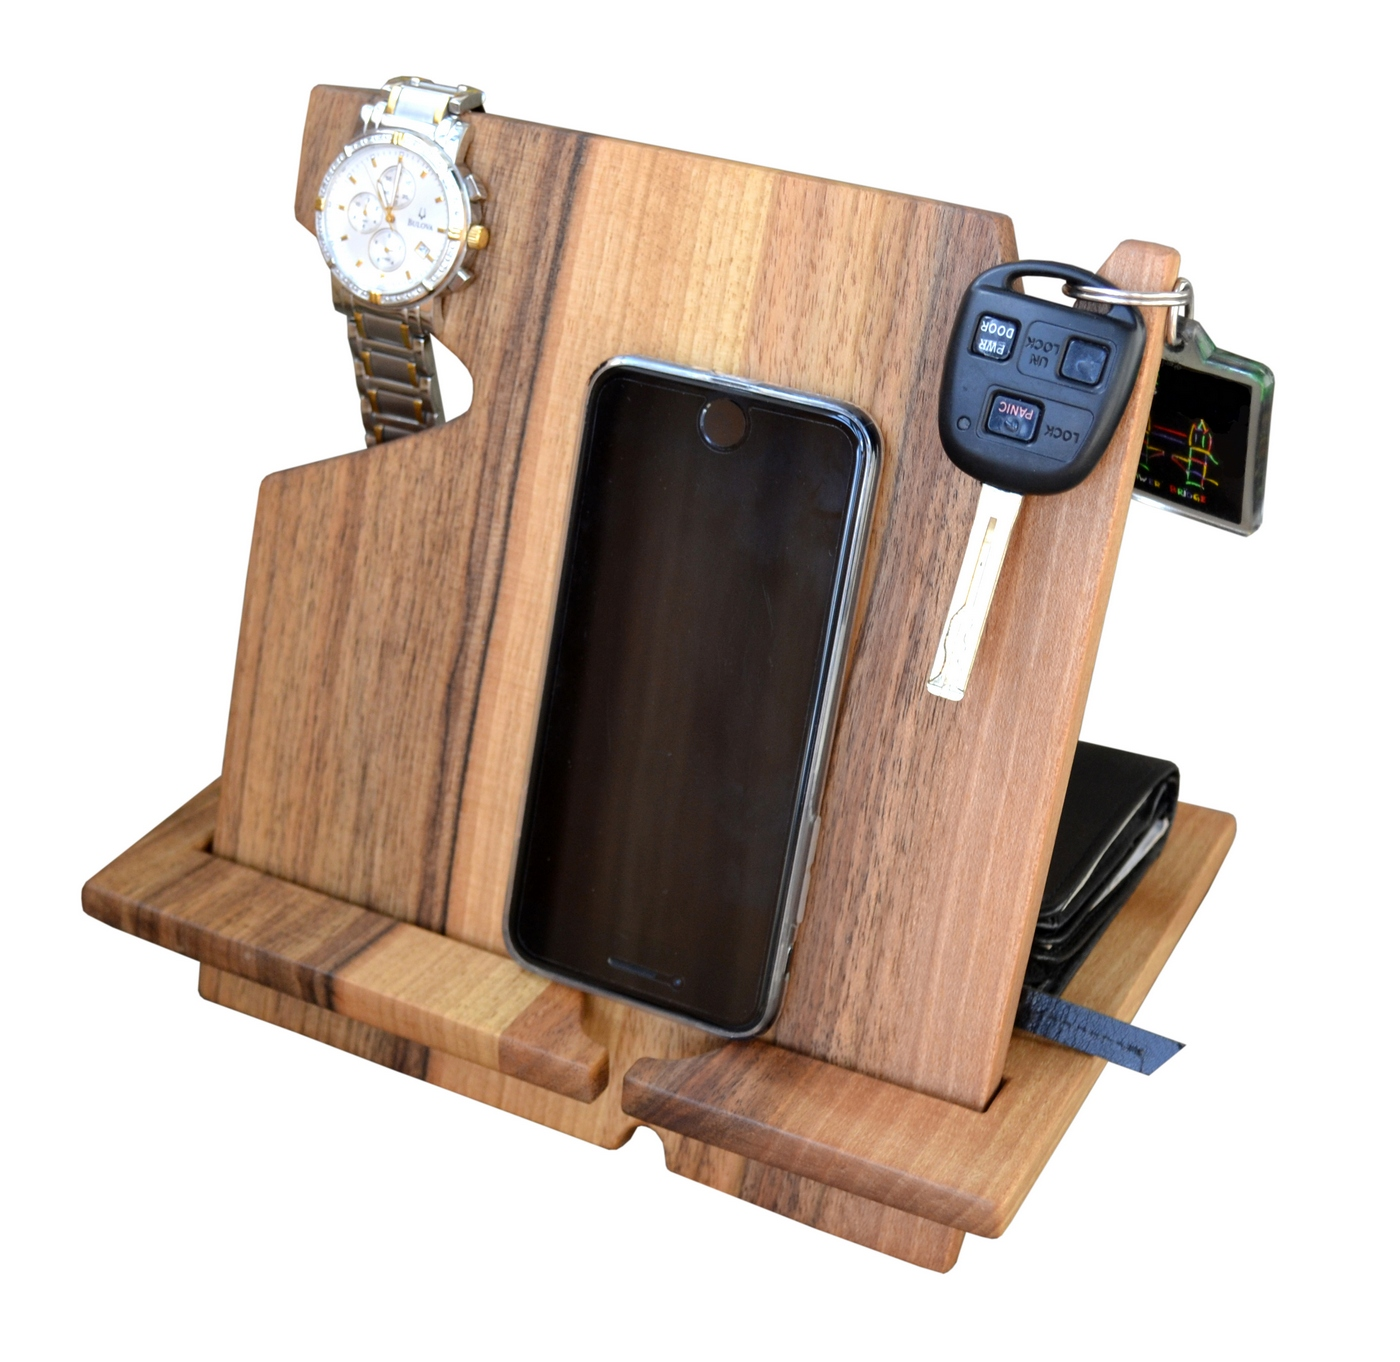 Buy Wood Phone Docking Station Walnut Desk Organizer